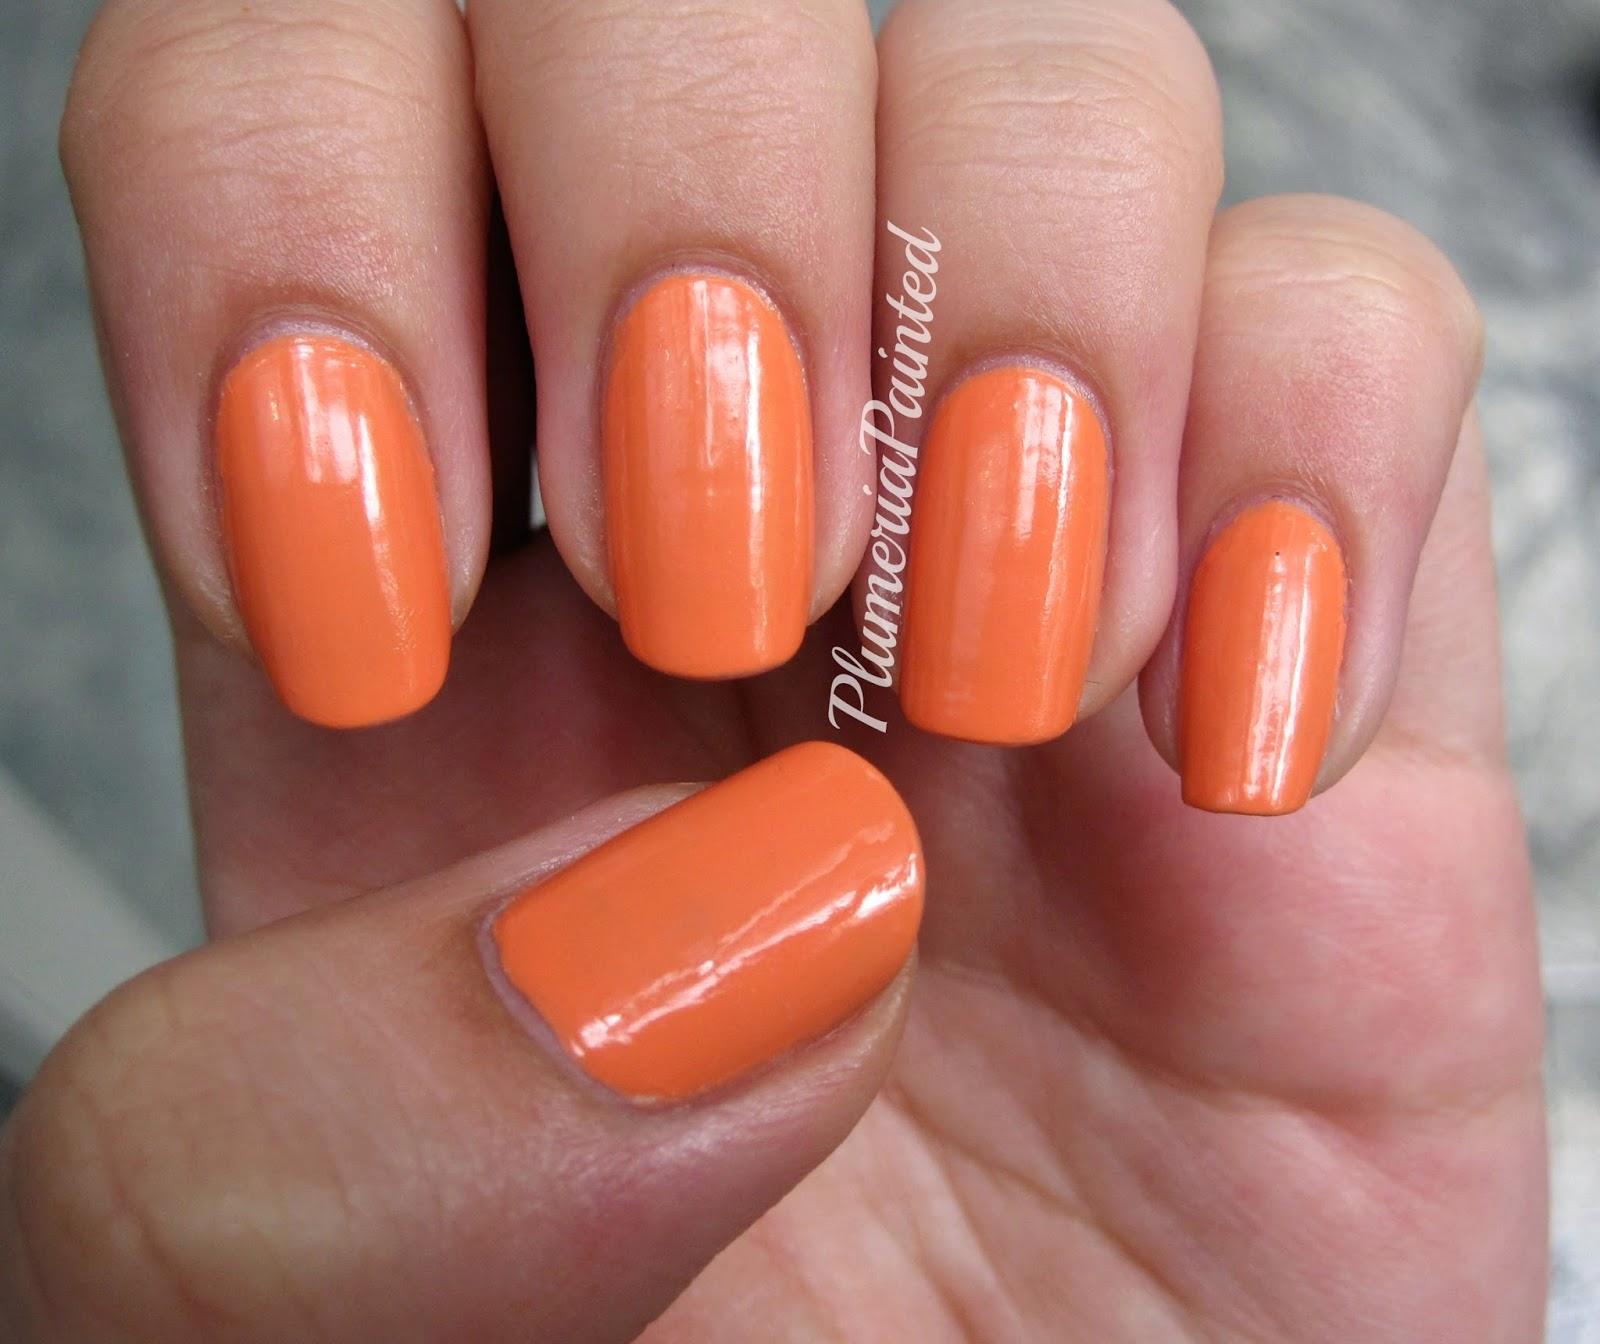 PlumeriaPainted: Orange Nails: OPI - Where Did Suzi\'s Man-go?